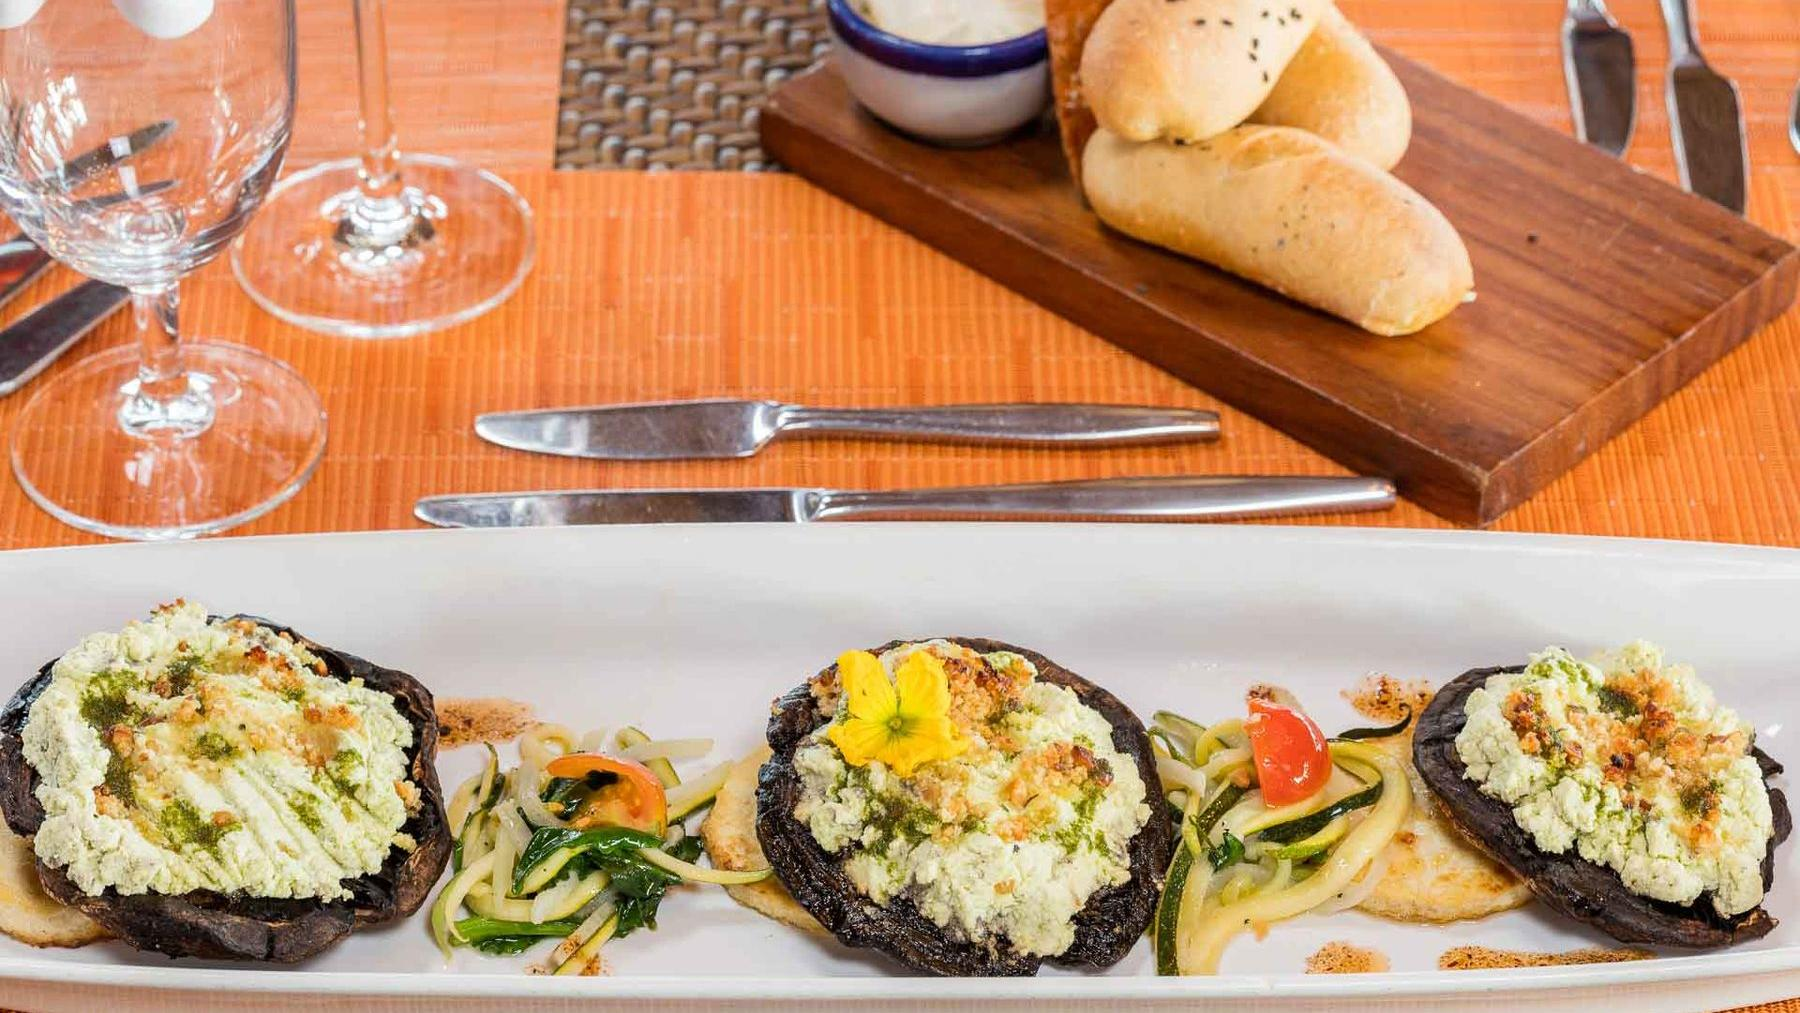 Pitayitas Dining Options